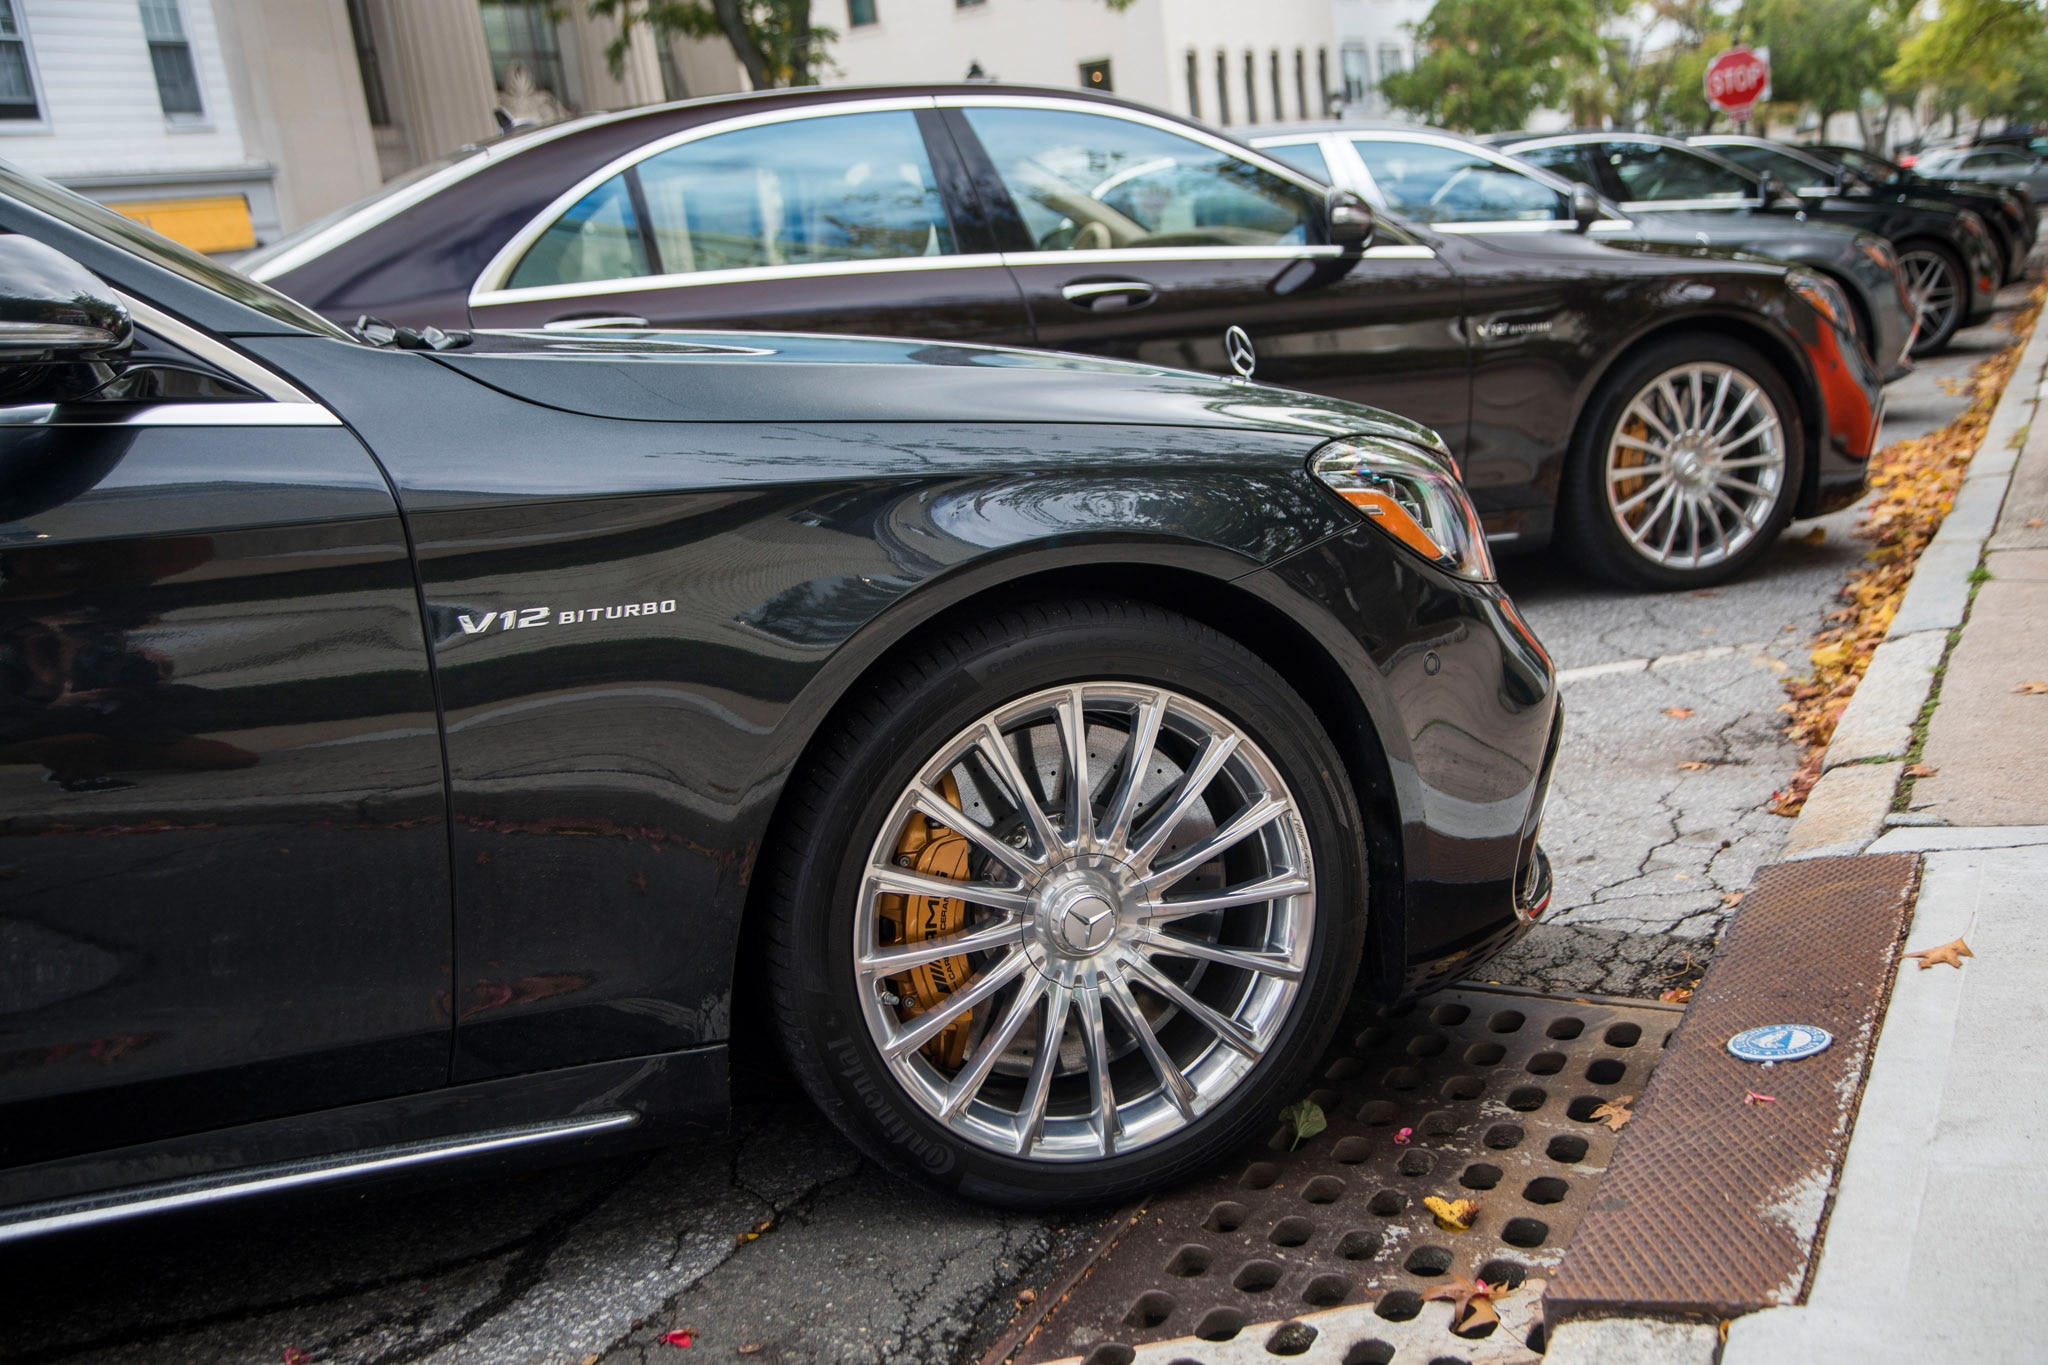 2018 Mercedes Benz S Class Sedan vs 2018 Mercedes AMG S Class Sedan